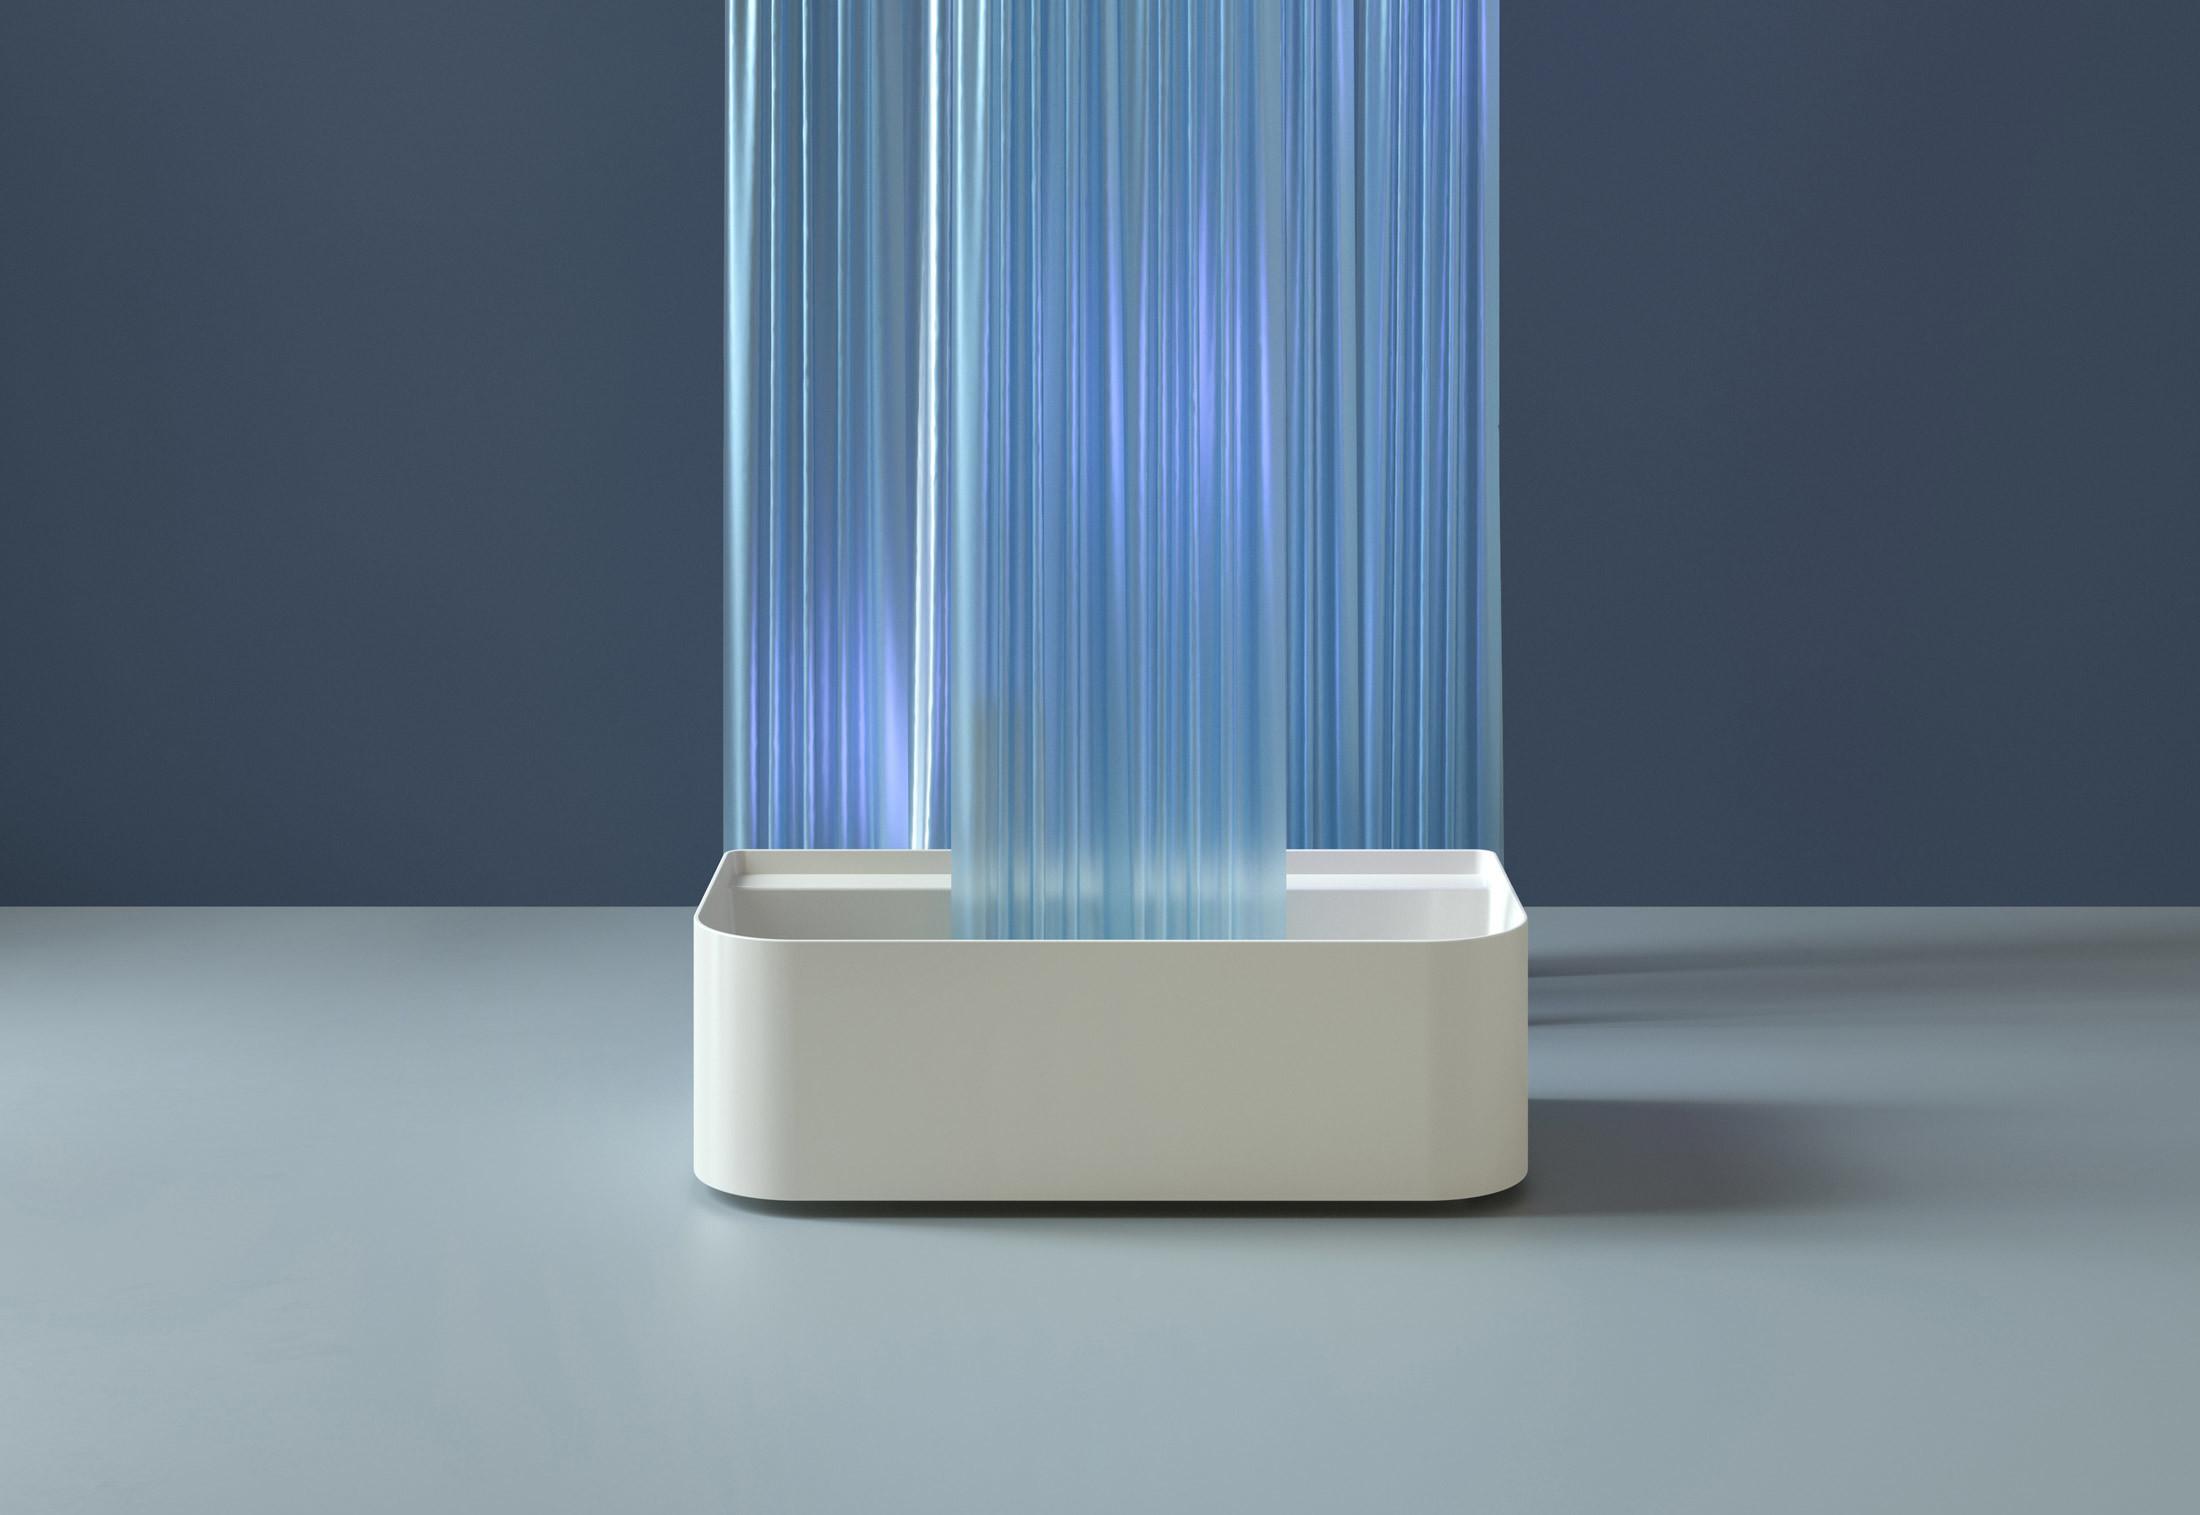 SaphirKeramik Sonar Freestanding bathtub by Laufen | STYLEPARK